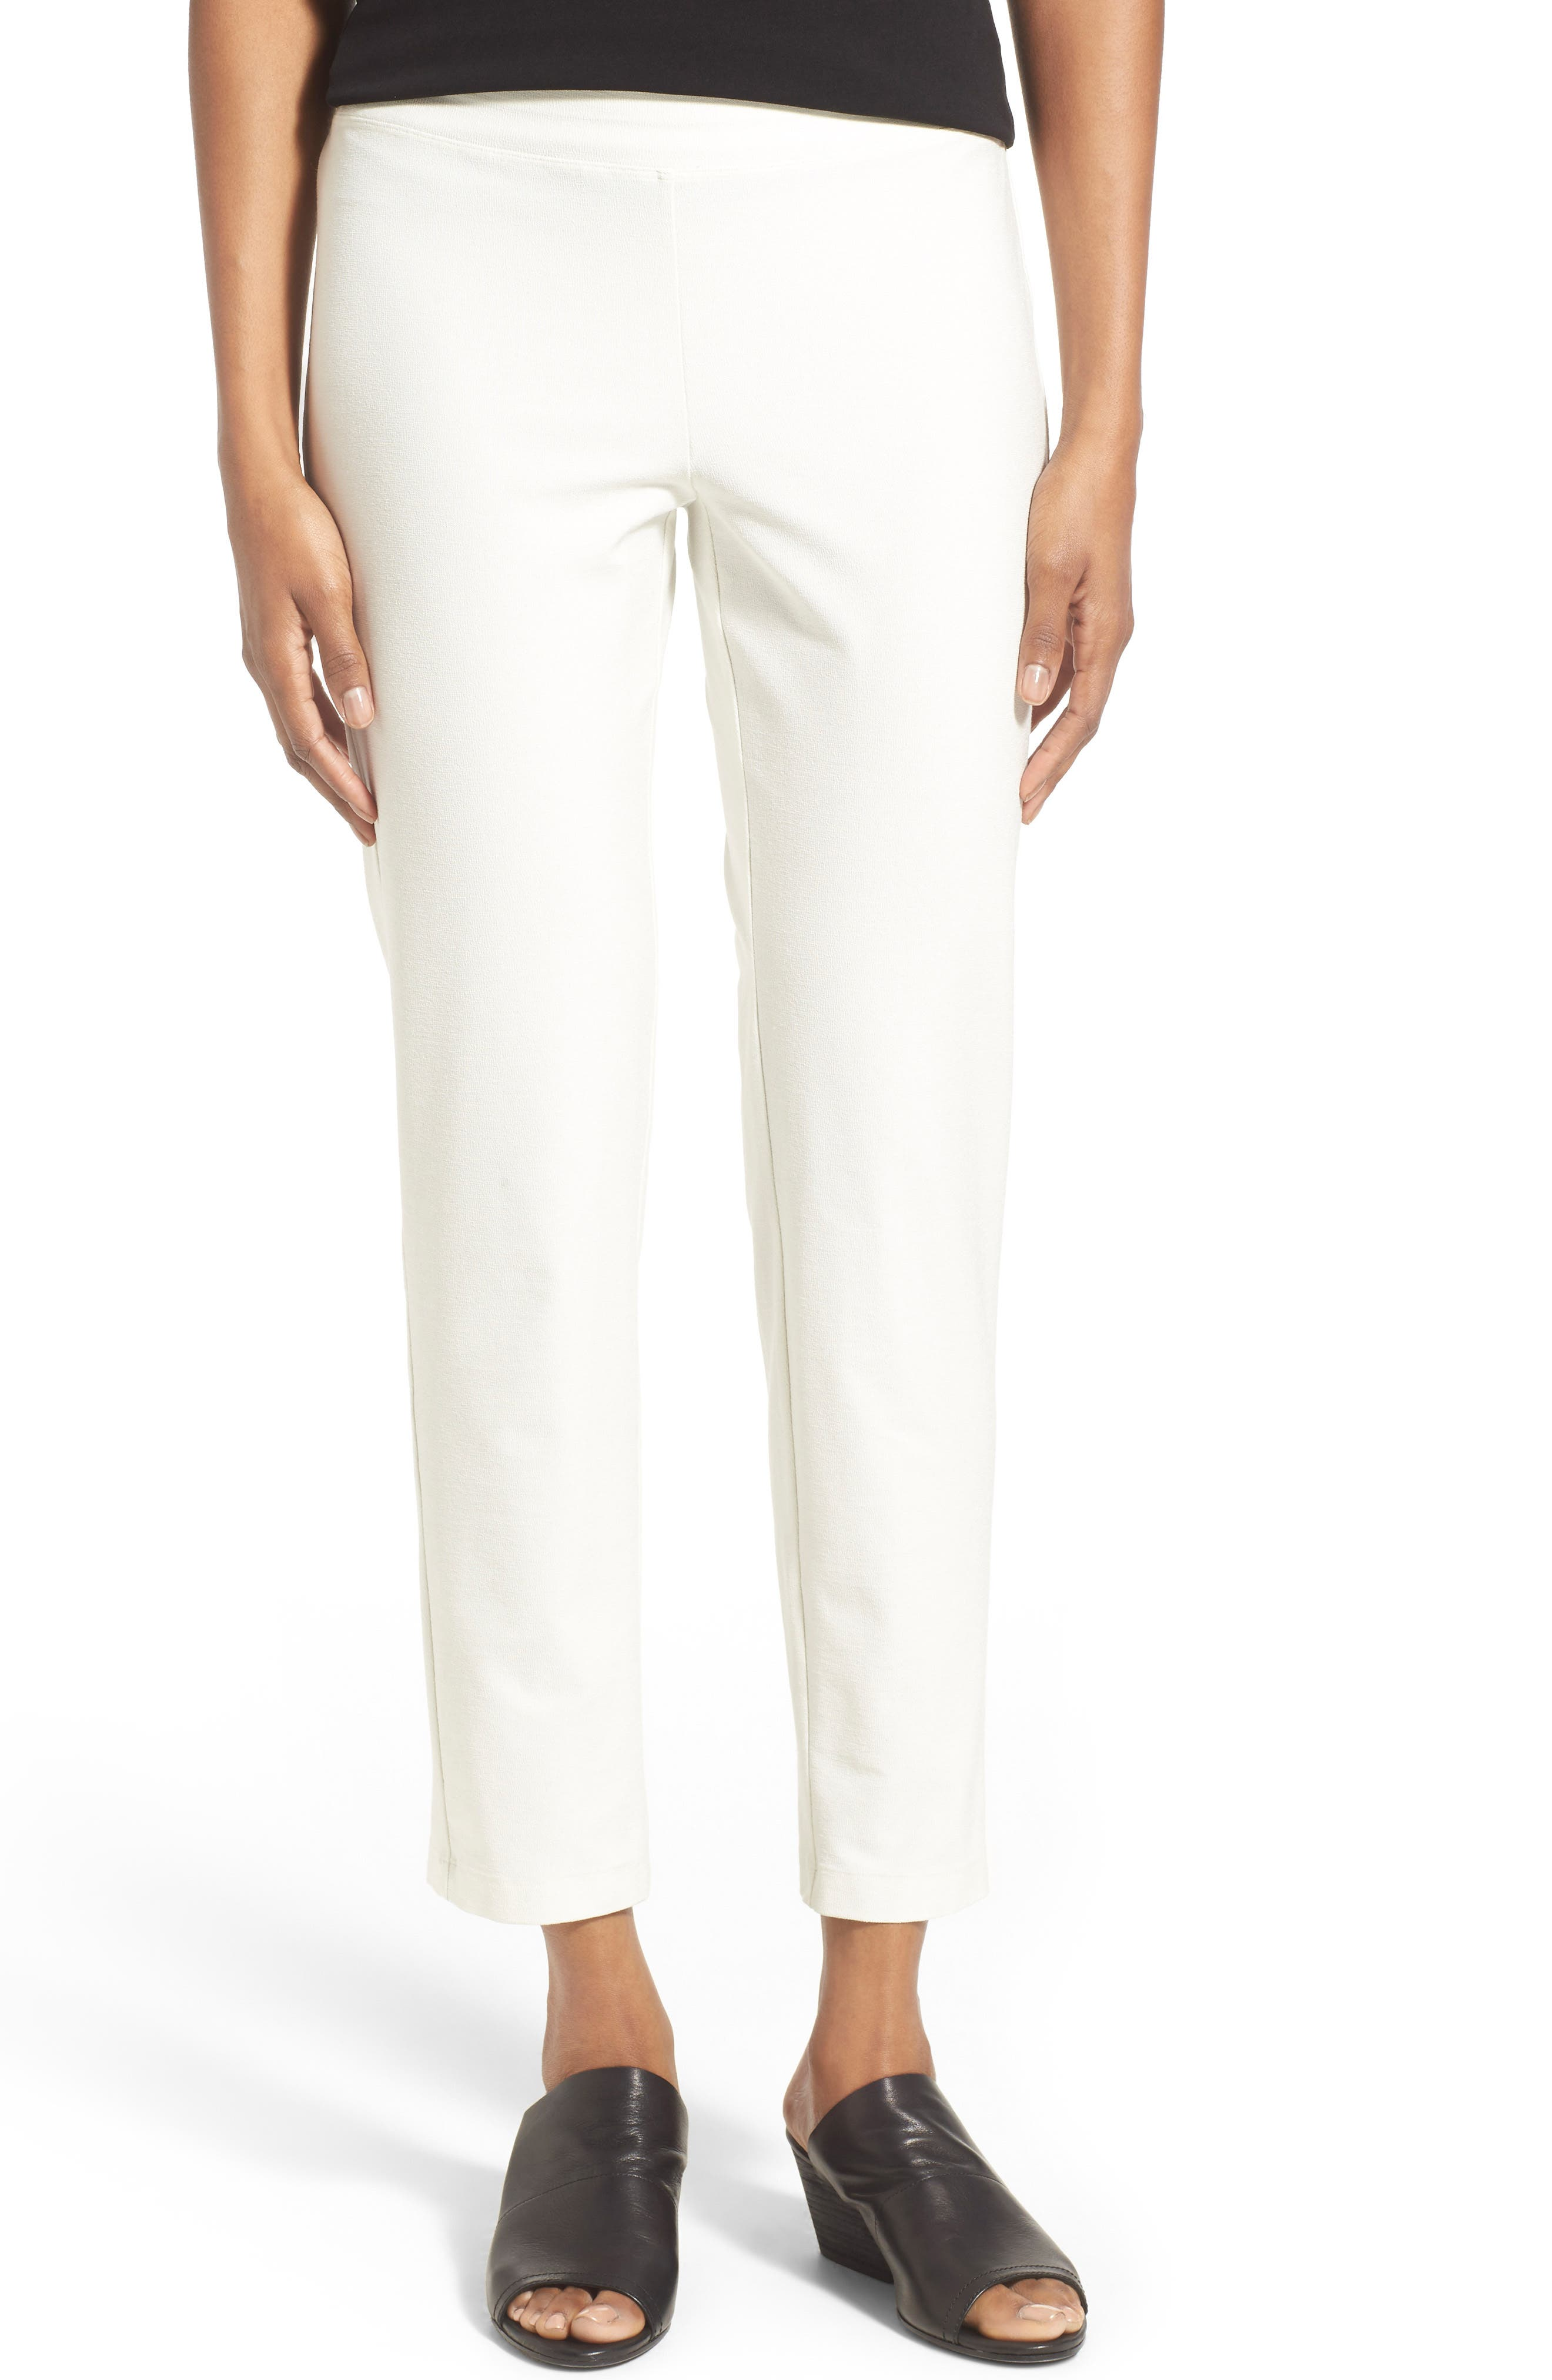 Alternate Image 1 Selected - Eileen Fisher Stretch Crepe Slim Ankle Pants (Regular & Petite)